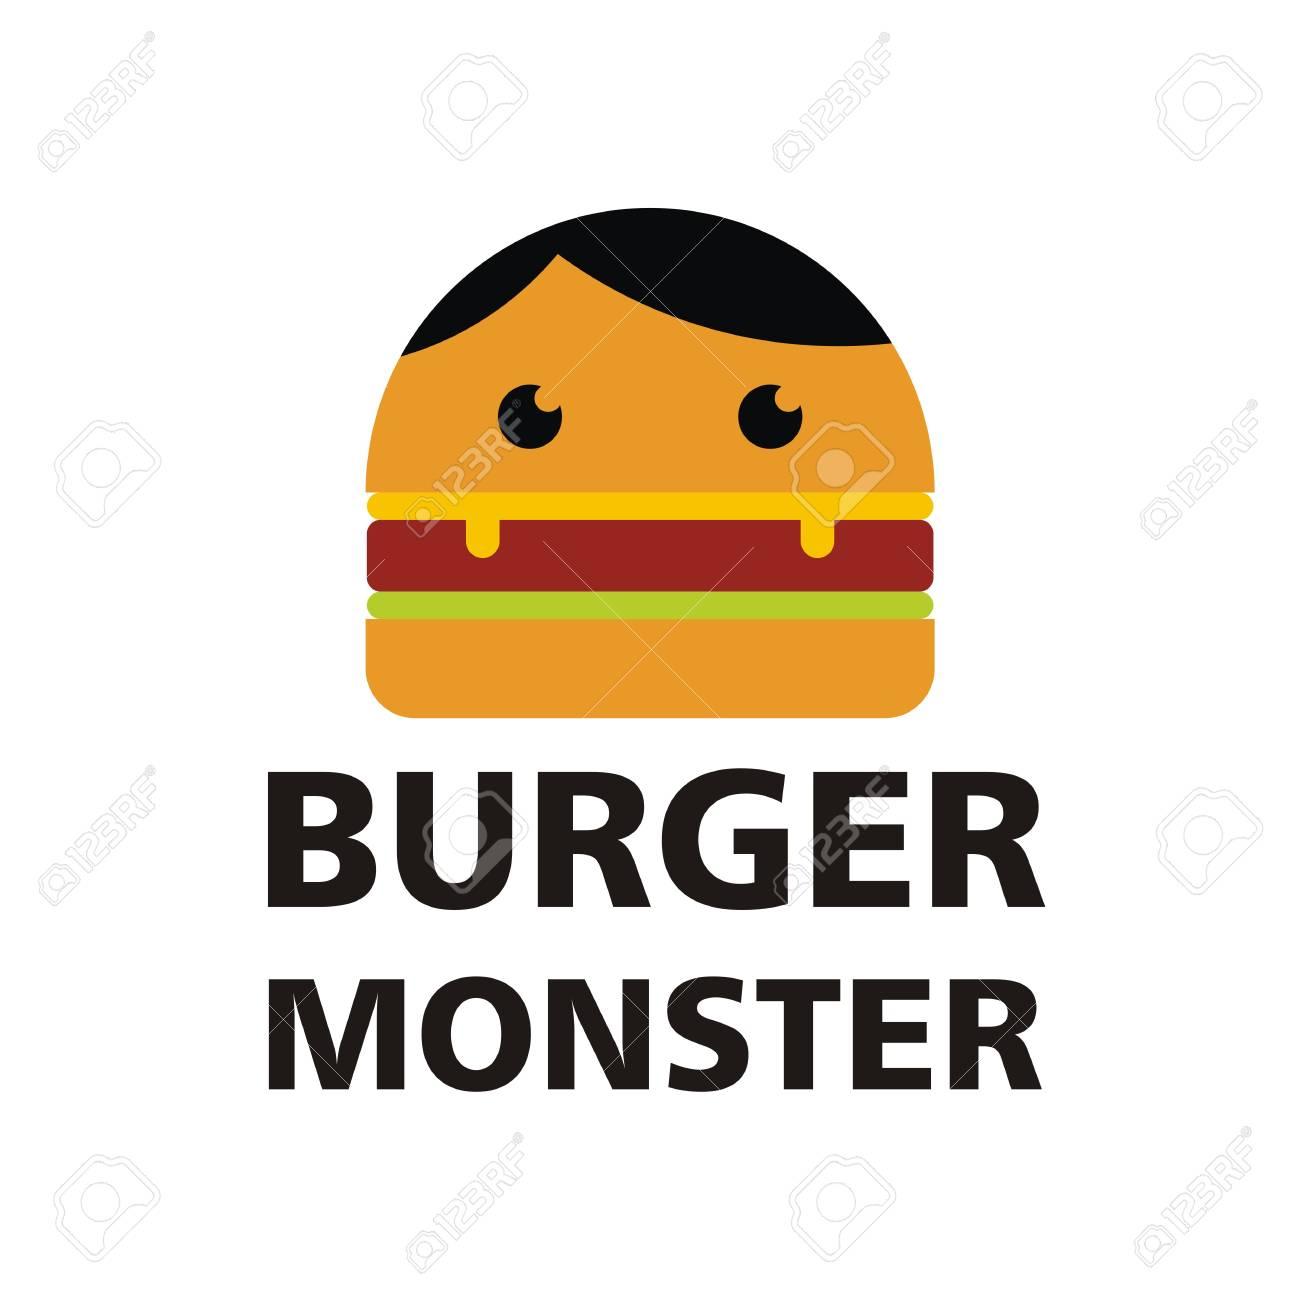 burger monster logo vector royalty free cliparts vectors and stock